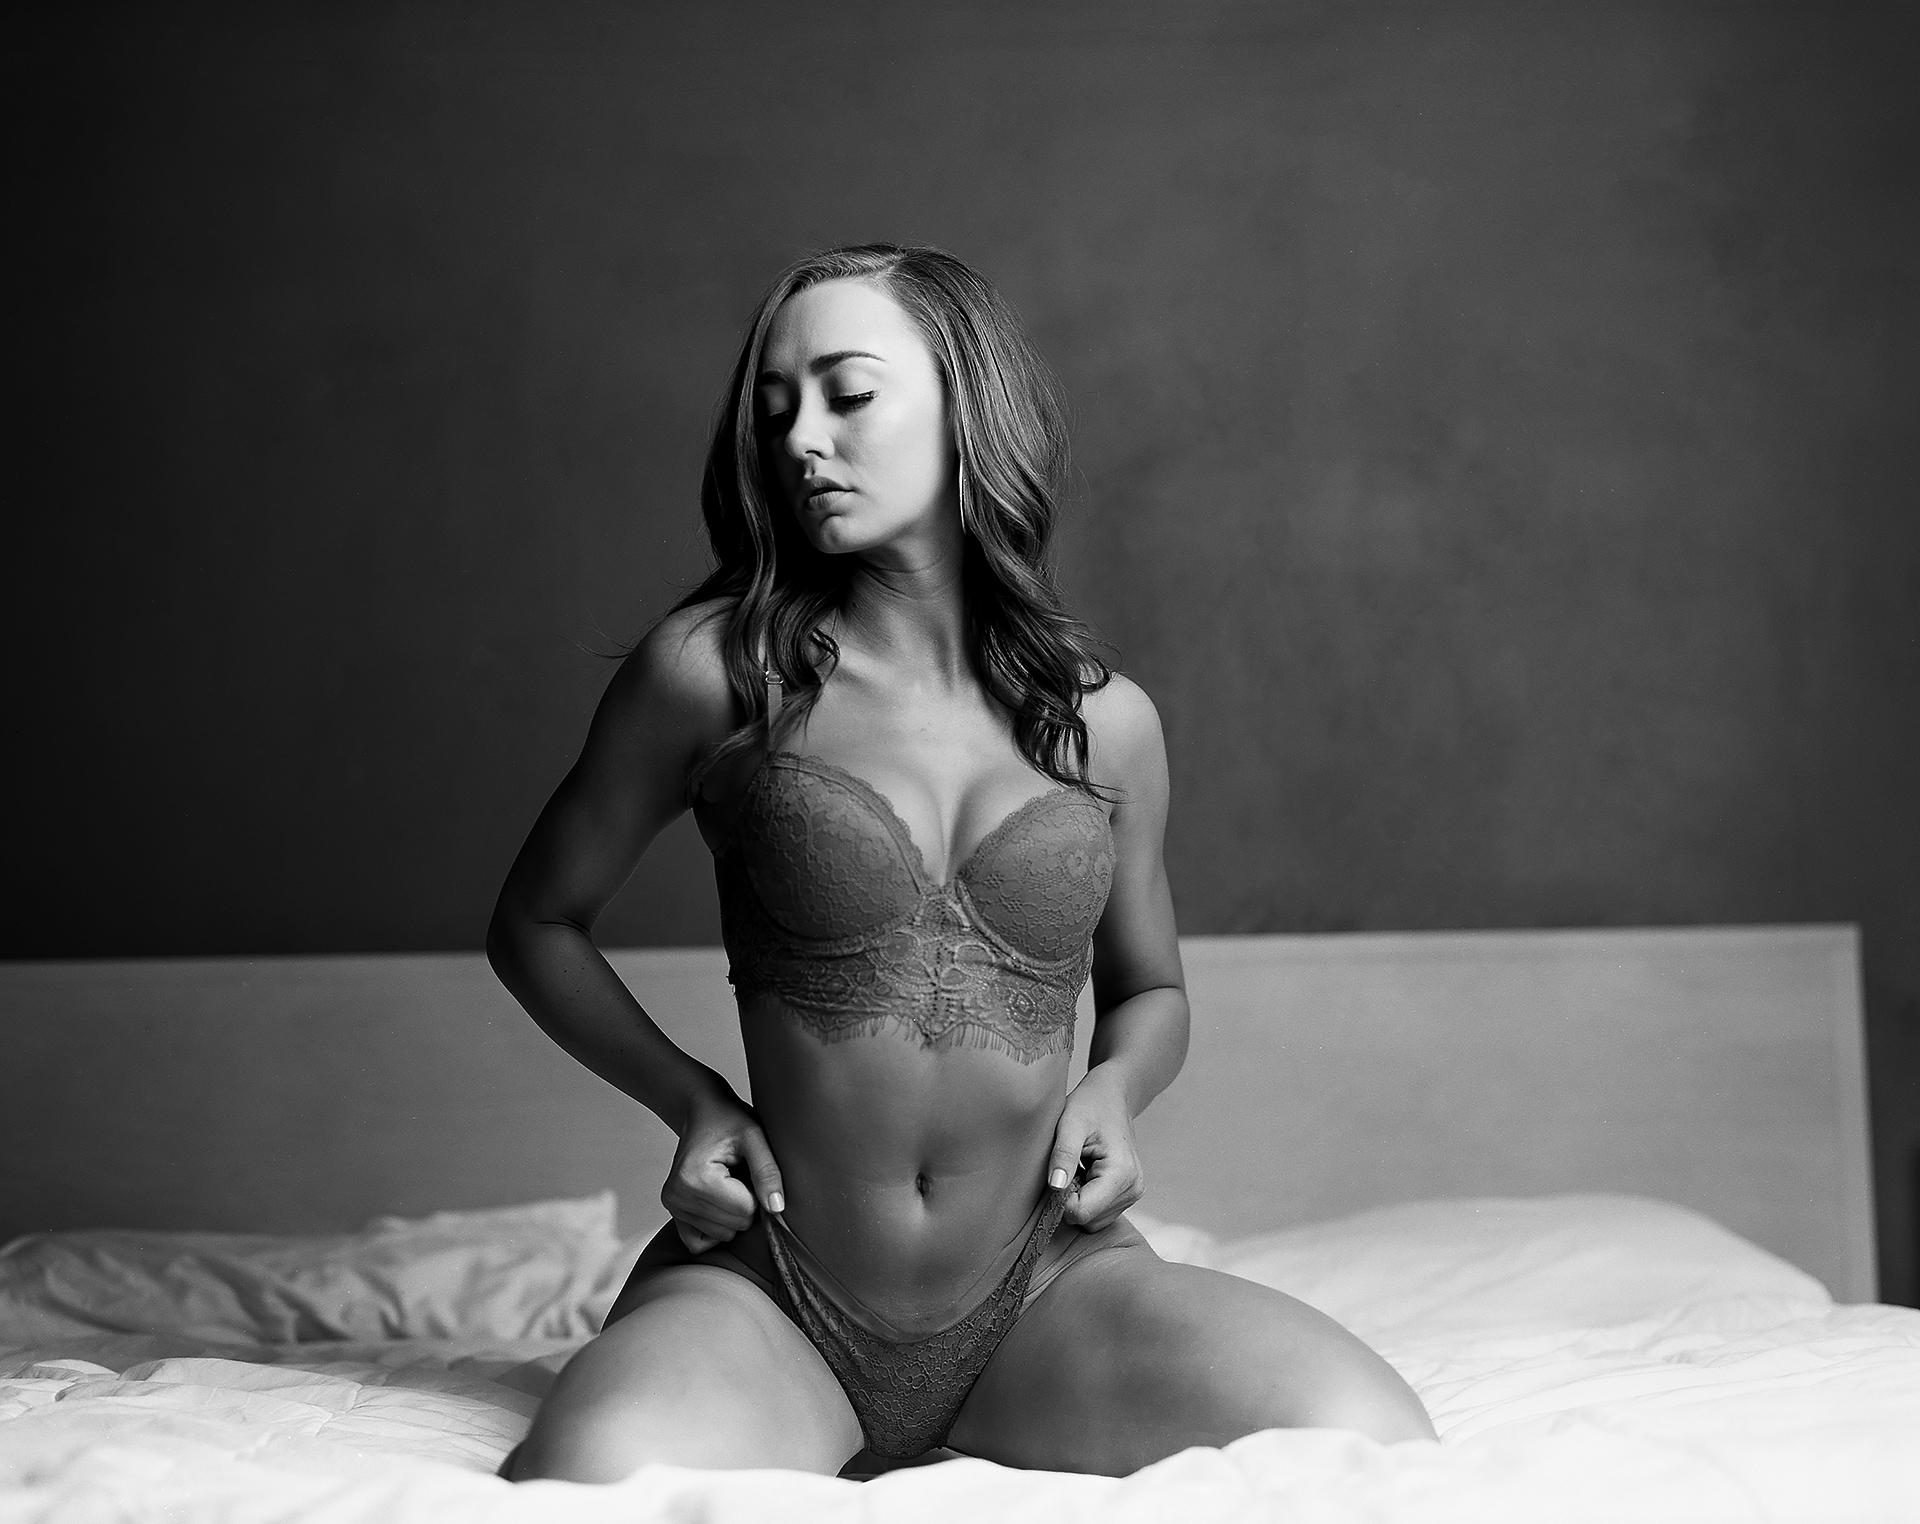 Katy003.jpg